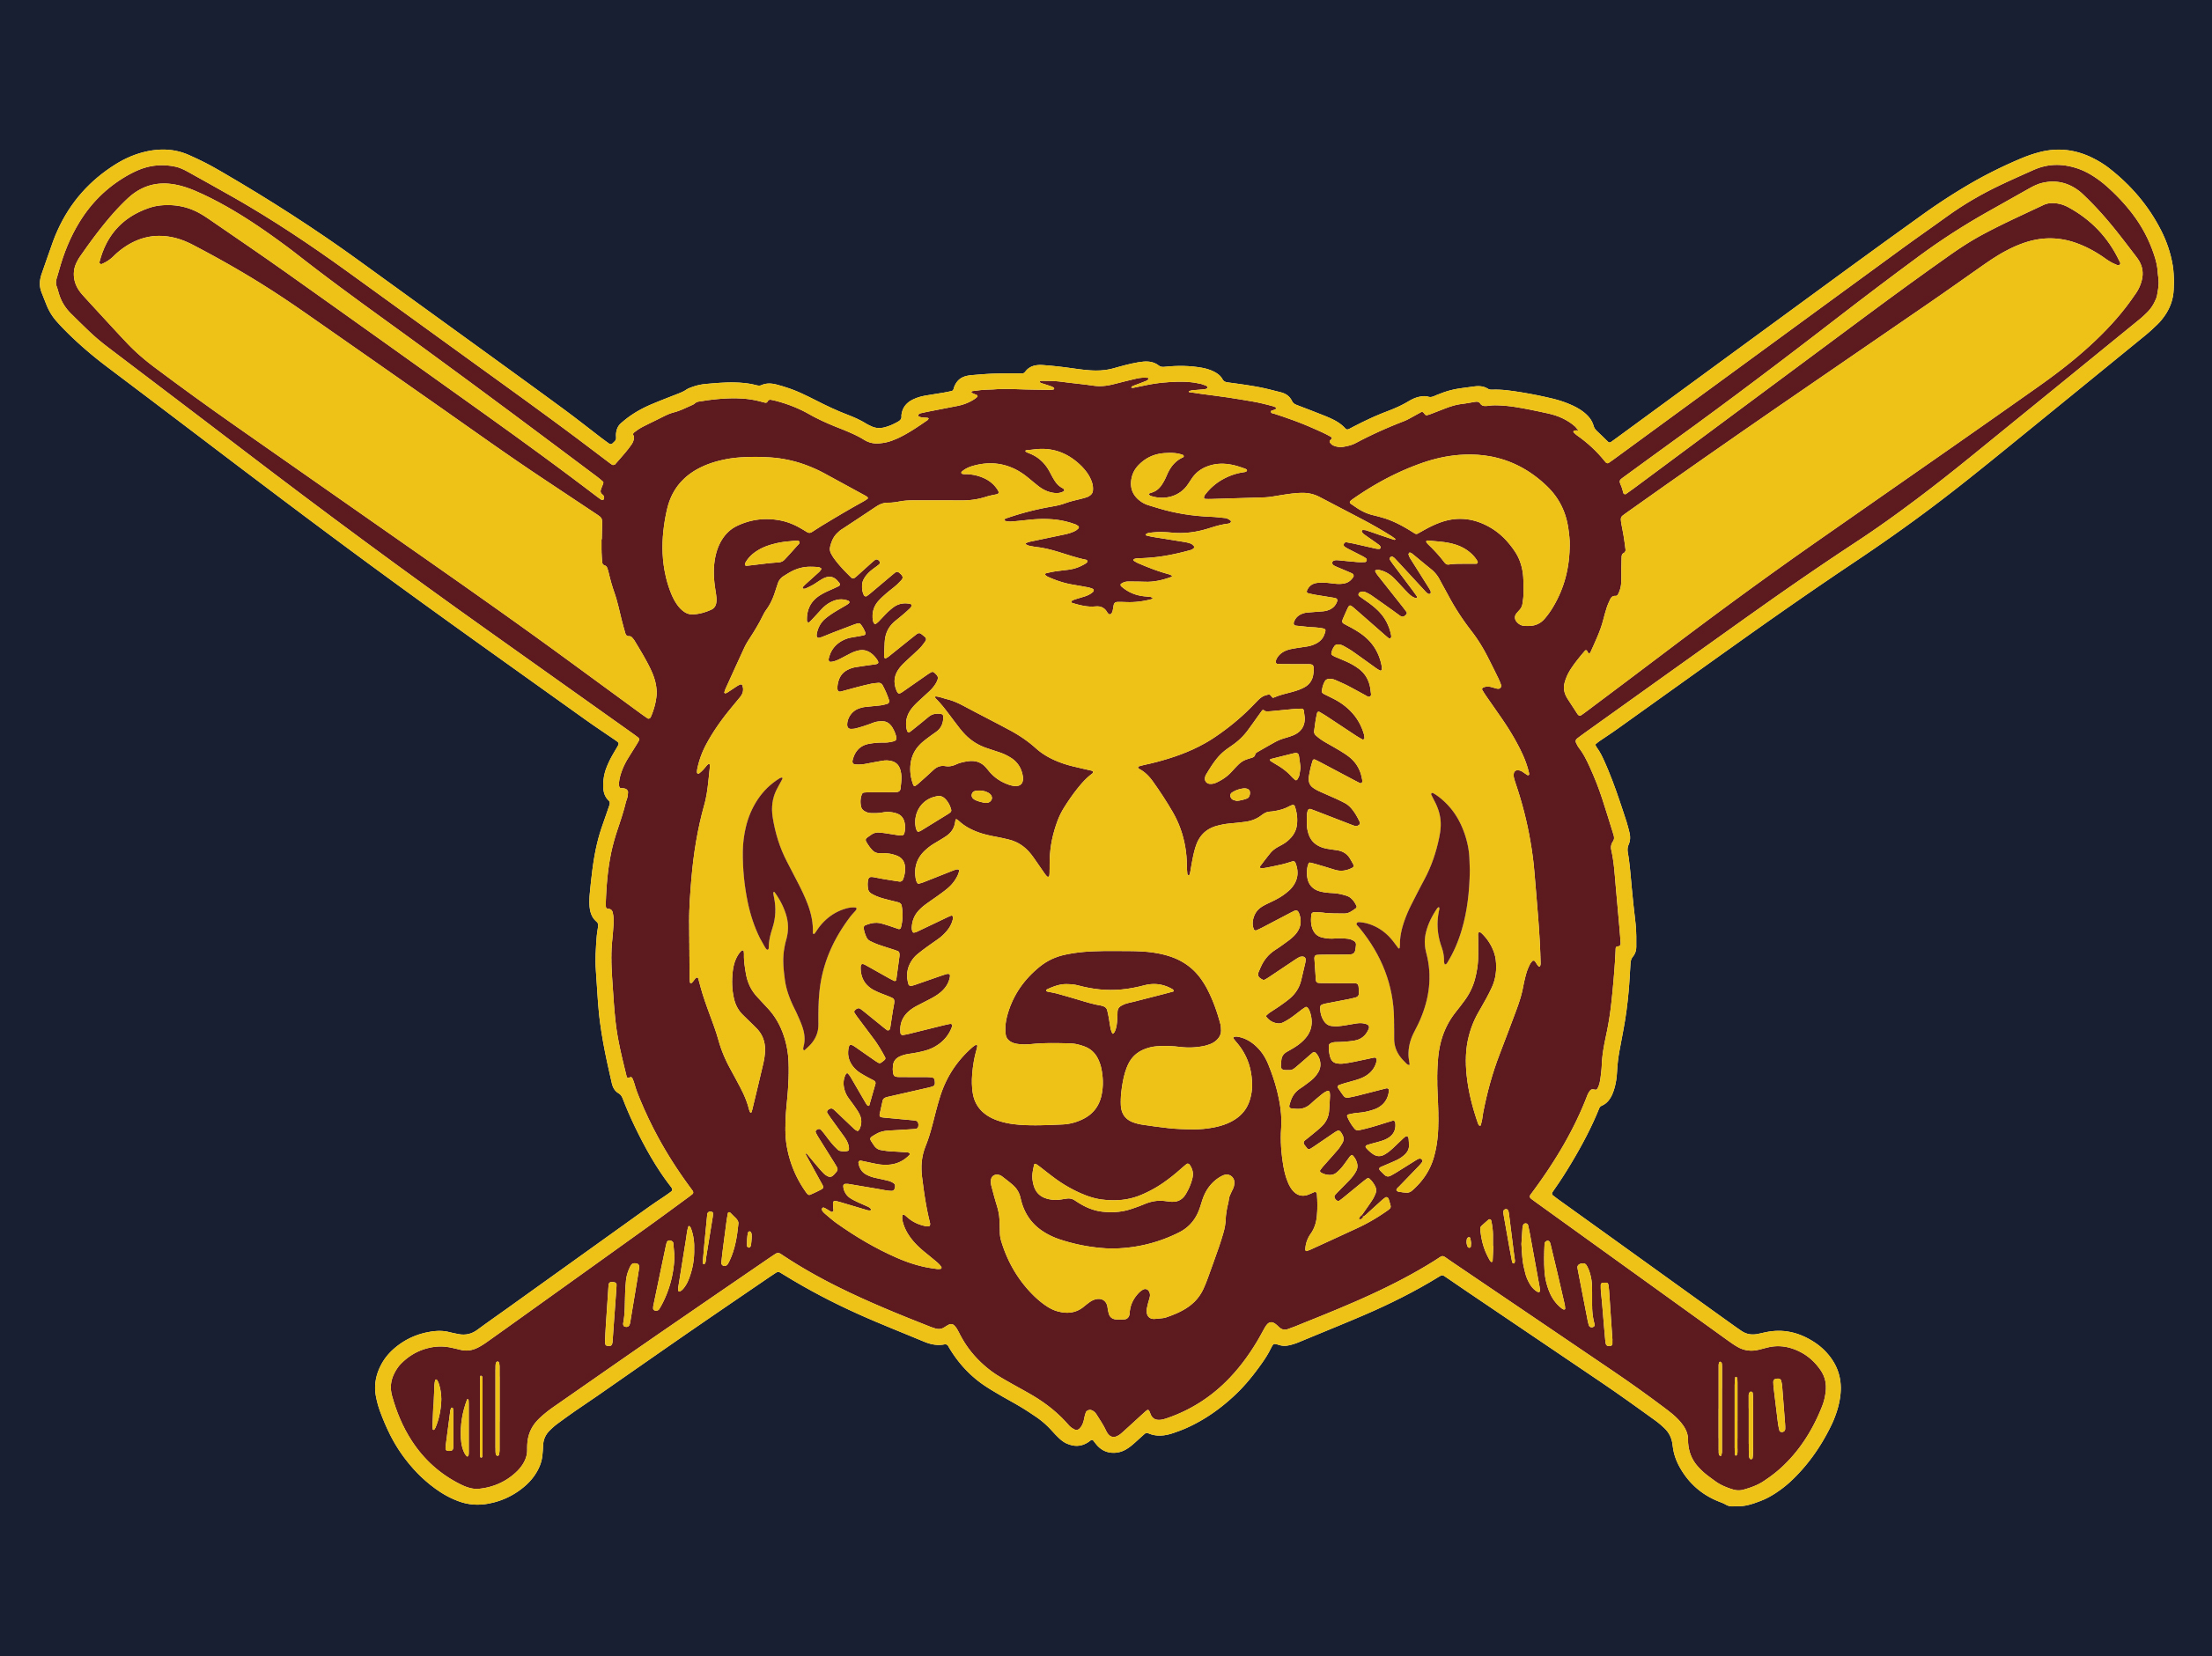 nyc-griz-cap-logo1a.jpg